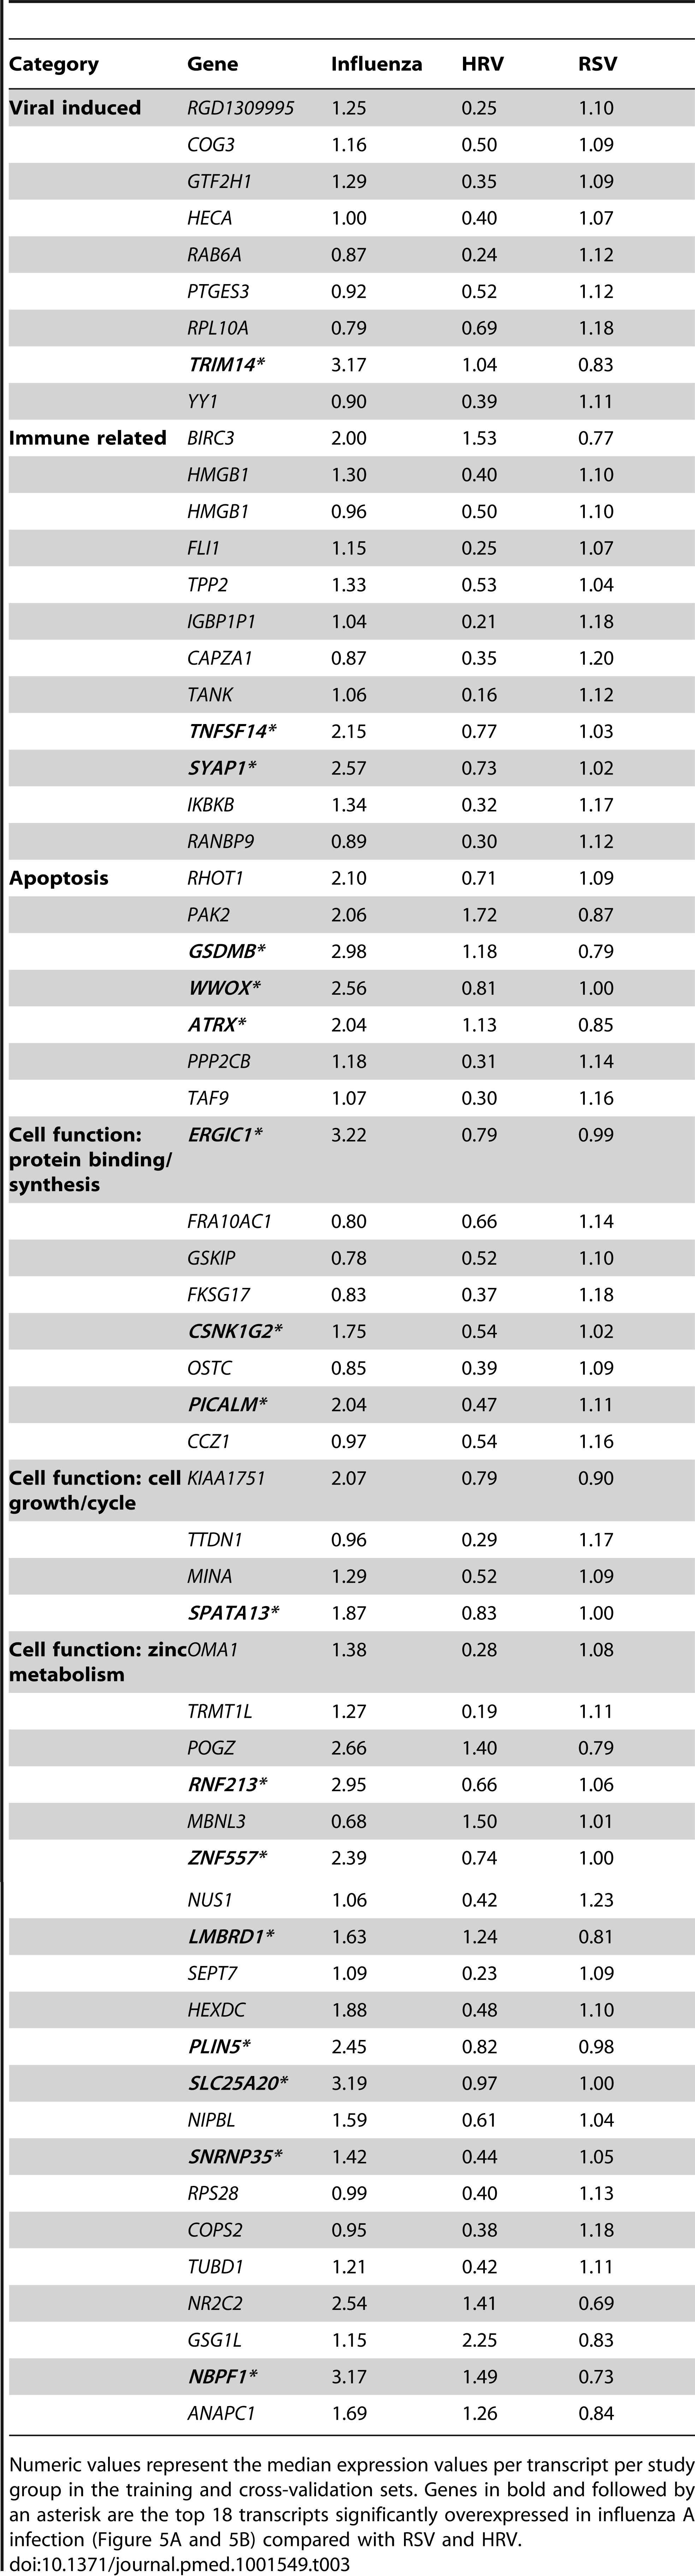 List of classifier genes that best discriminate RSV from influenza A and rhinovirus LRTI.